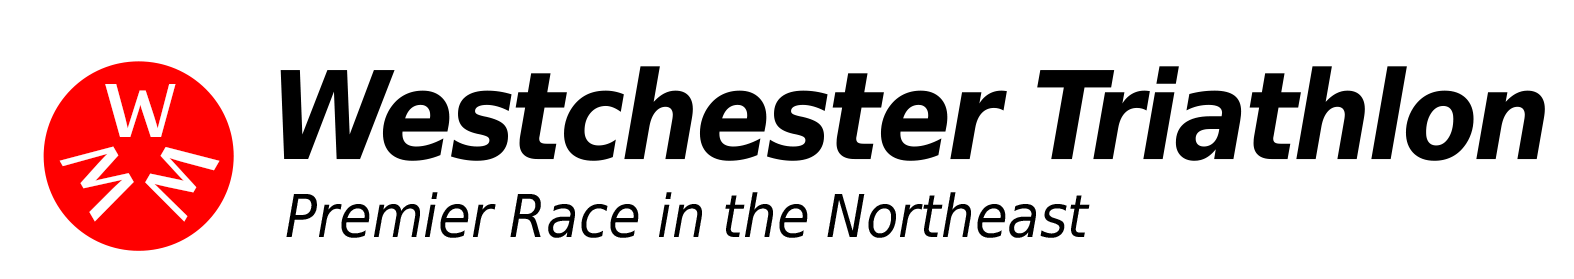 537a52fb-a83f-47c7-a697-d6144feab823